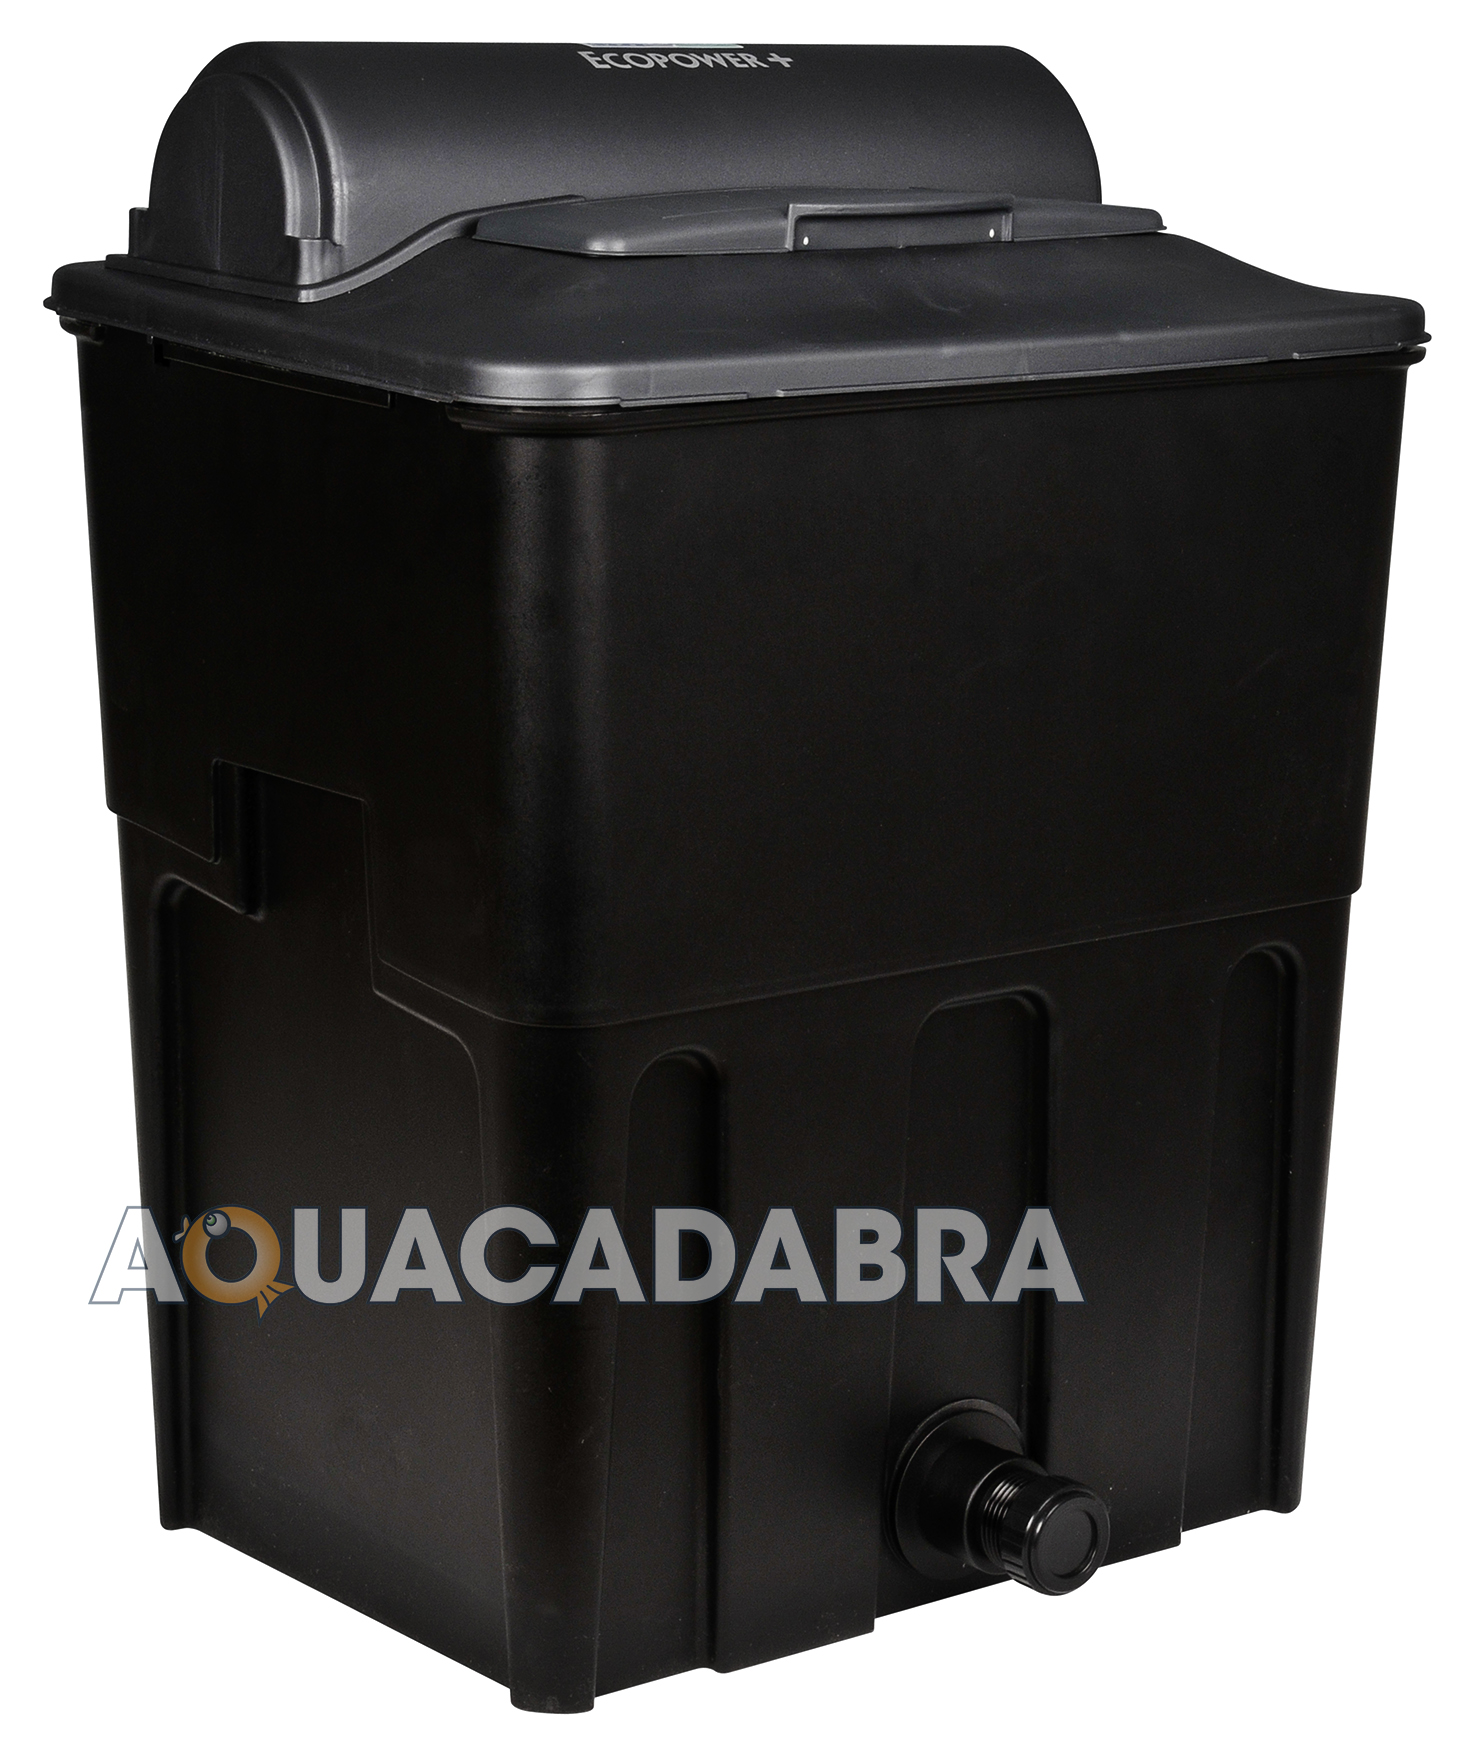 Hozelock ecopower pond filter uv uvc water filtration for Koi filtration